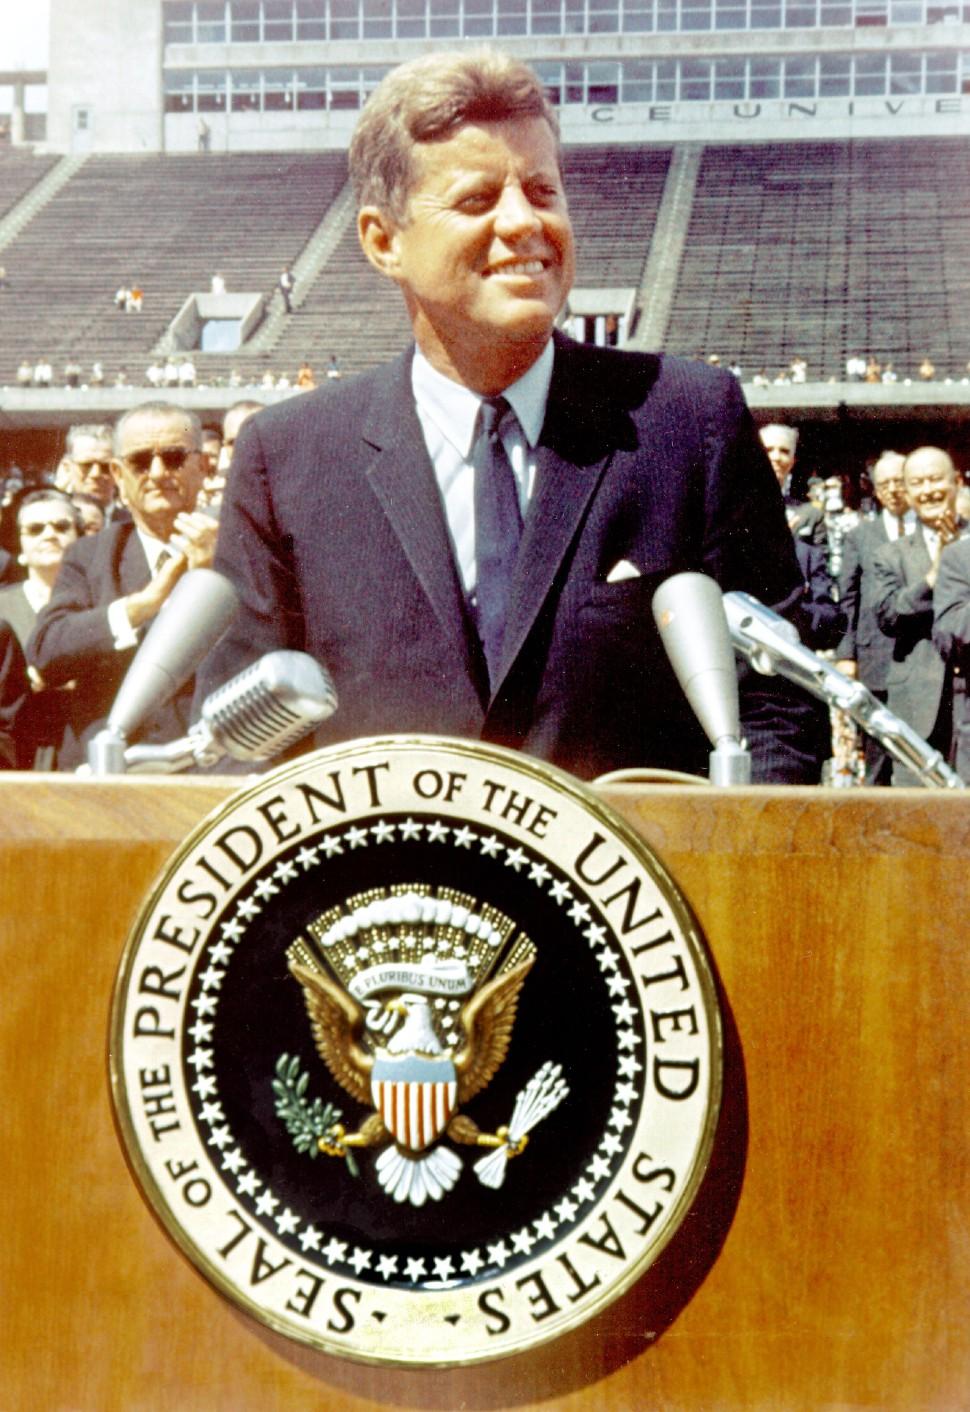 Kennedy Rice speech feb 64 c Mediapunch Shuttersto